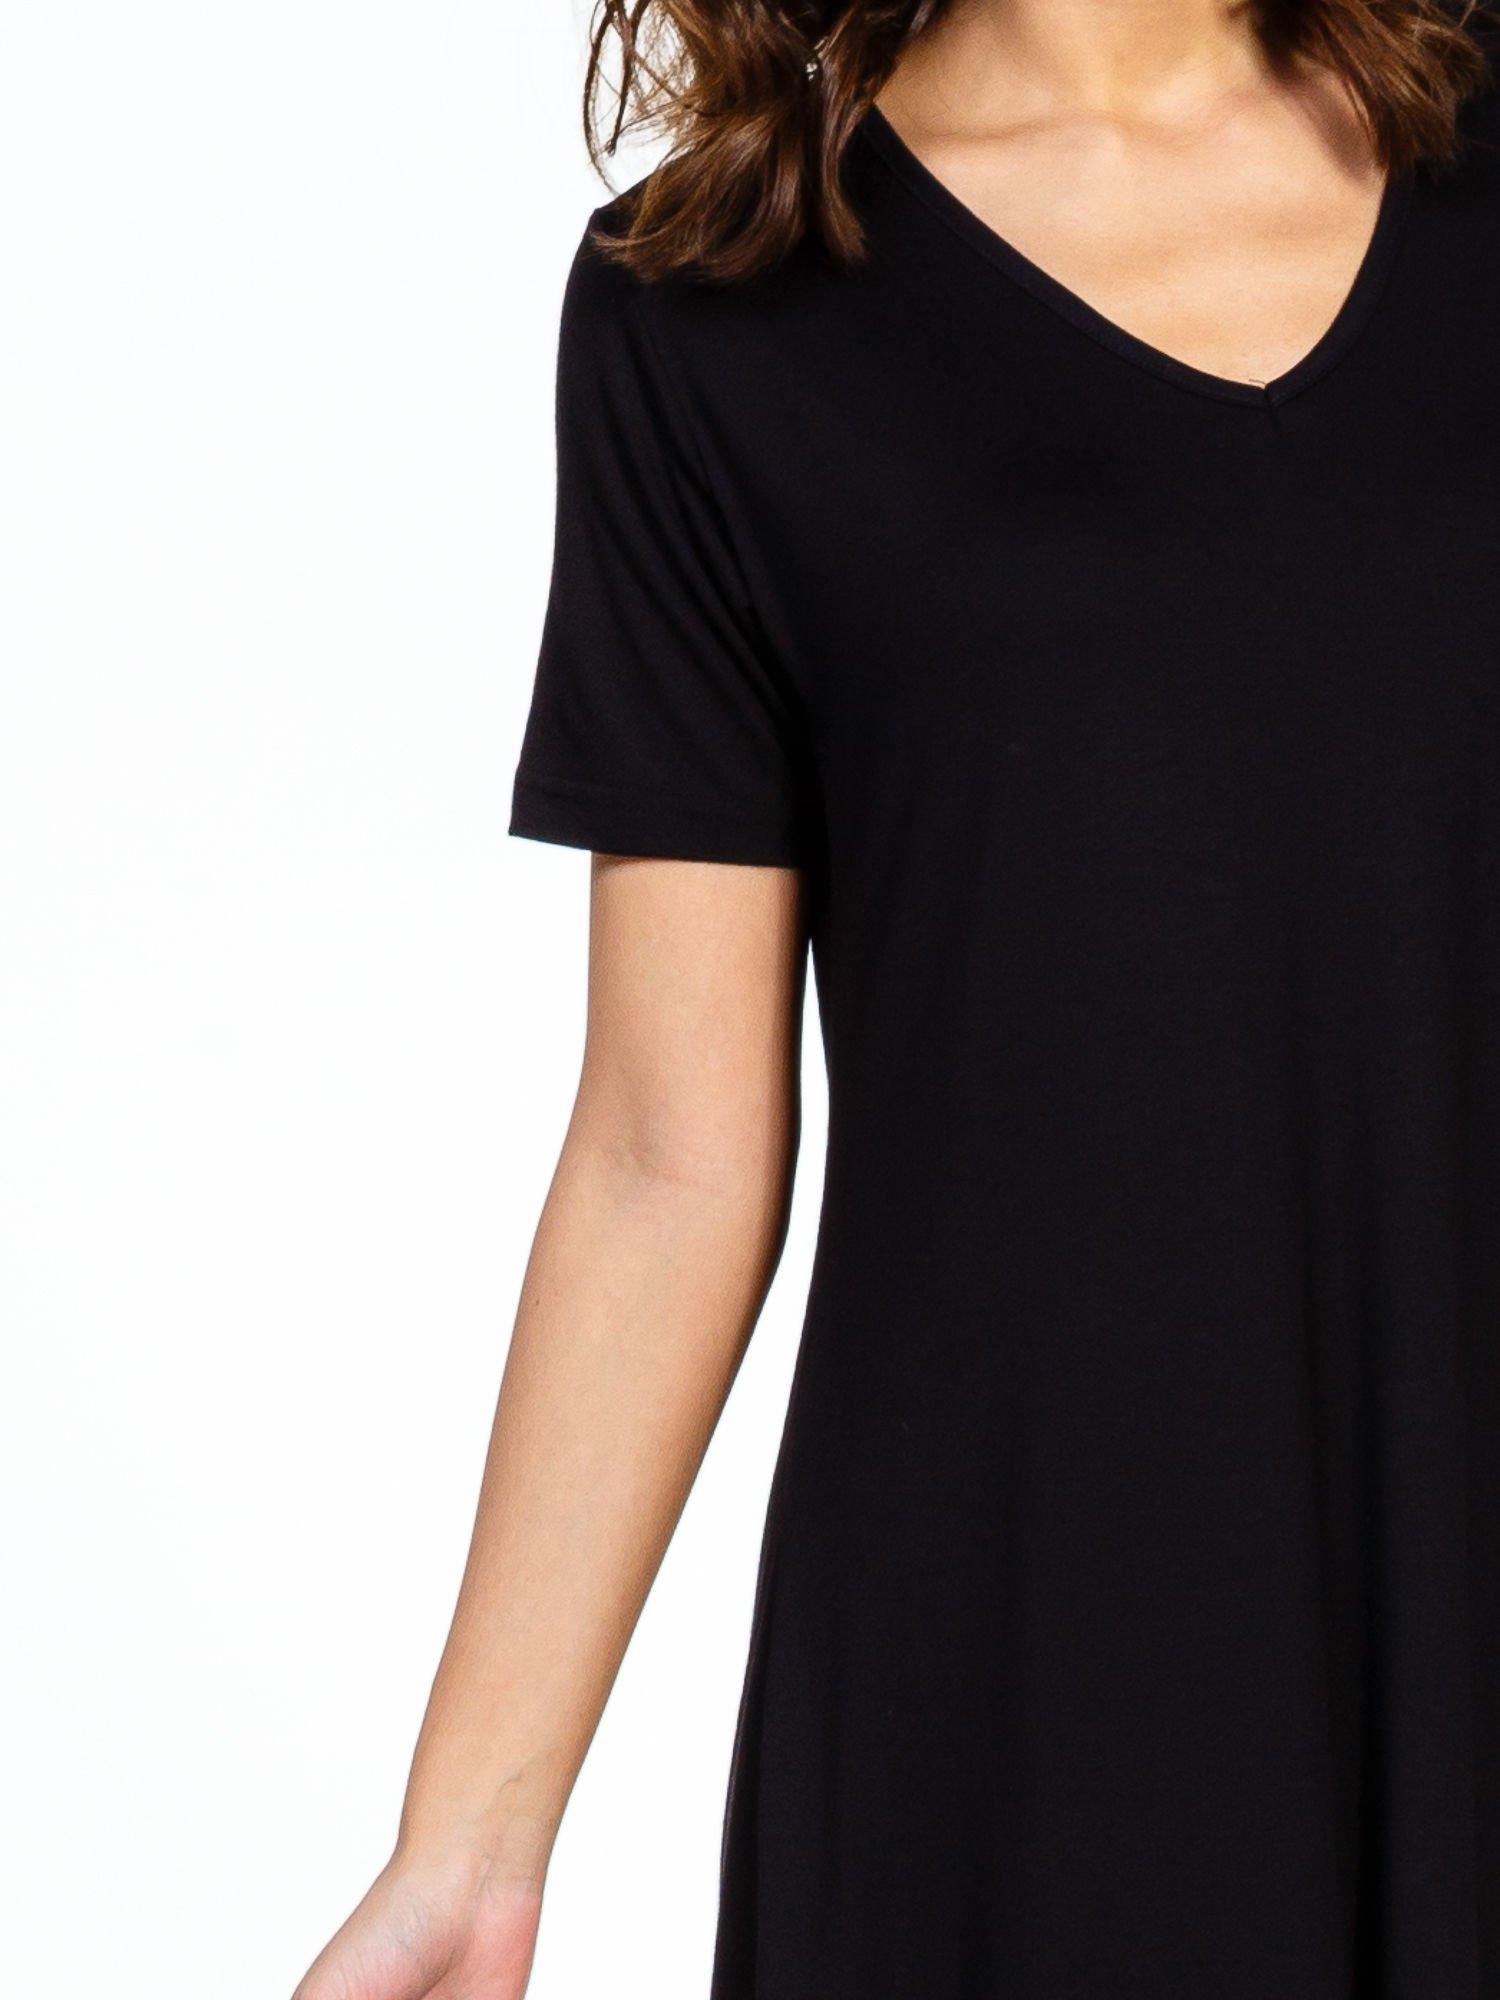 Czarna luźna sukienka z asymetrycznym dołem                                  zdj.                                  4